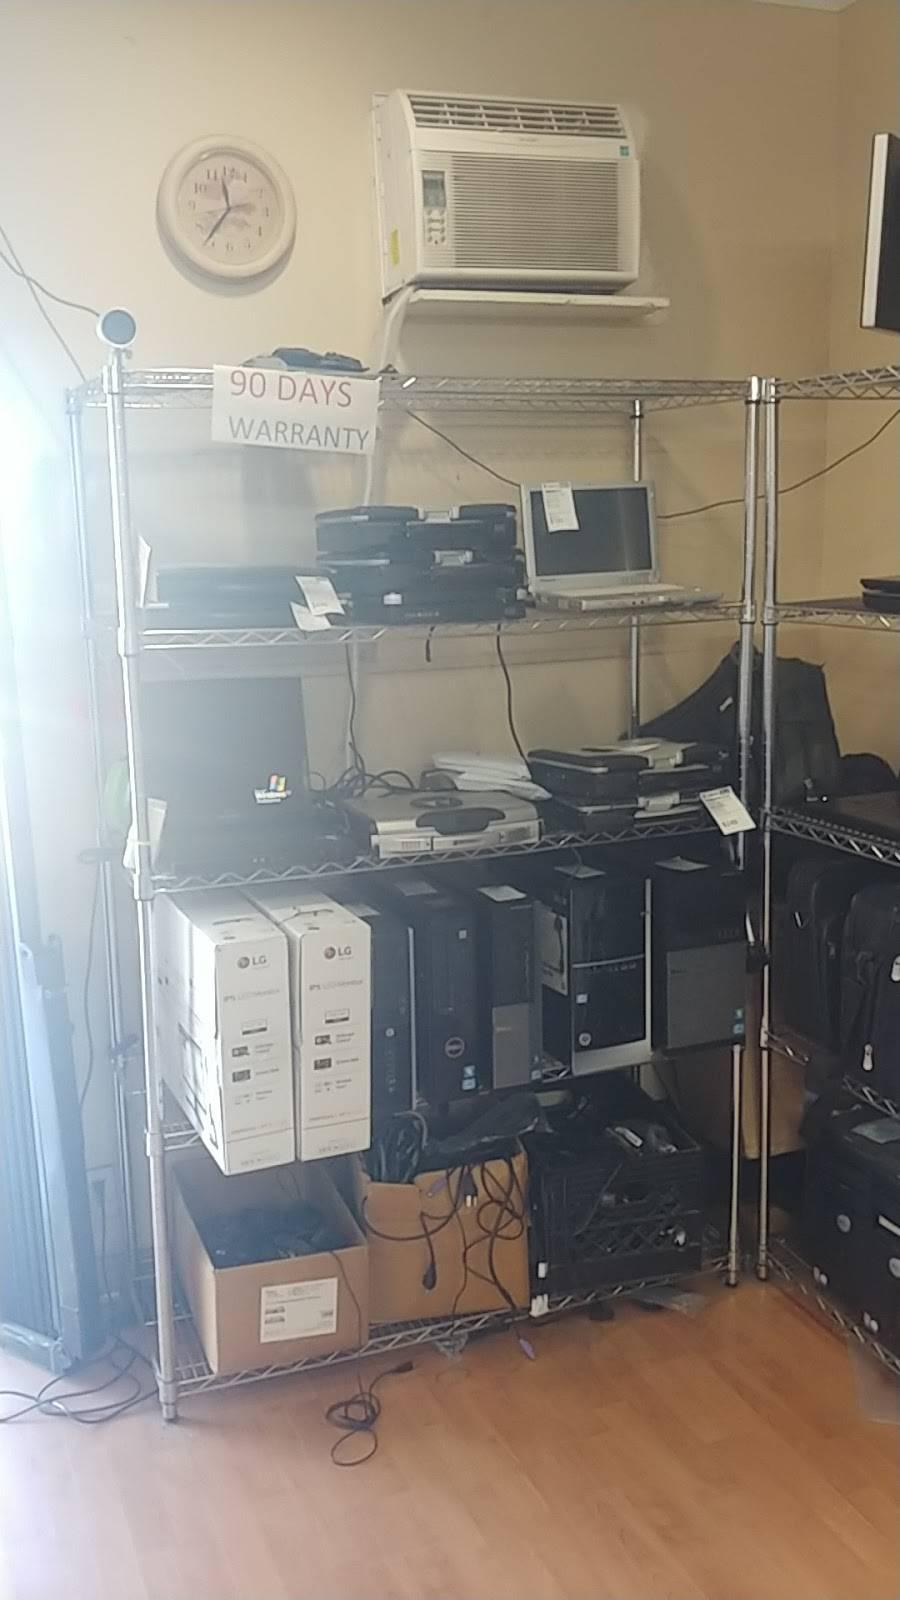 Comdory Computer - electronics store  | Photo 5 of 5 | Address: 9636 W Garden Grove Blvd #6, Garden Grove, CA 92844, USA | Phone: (714) 944-4401